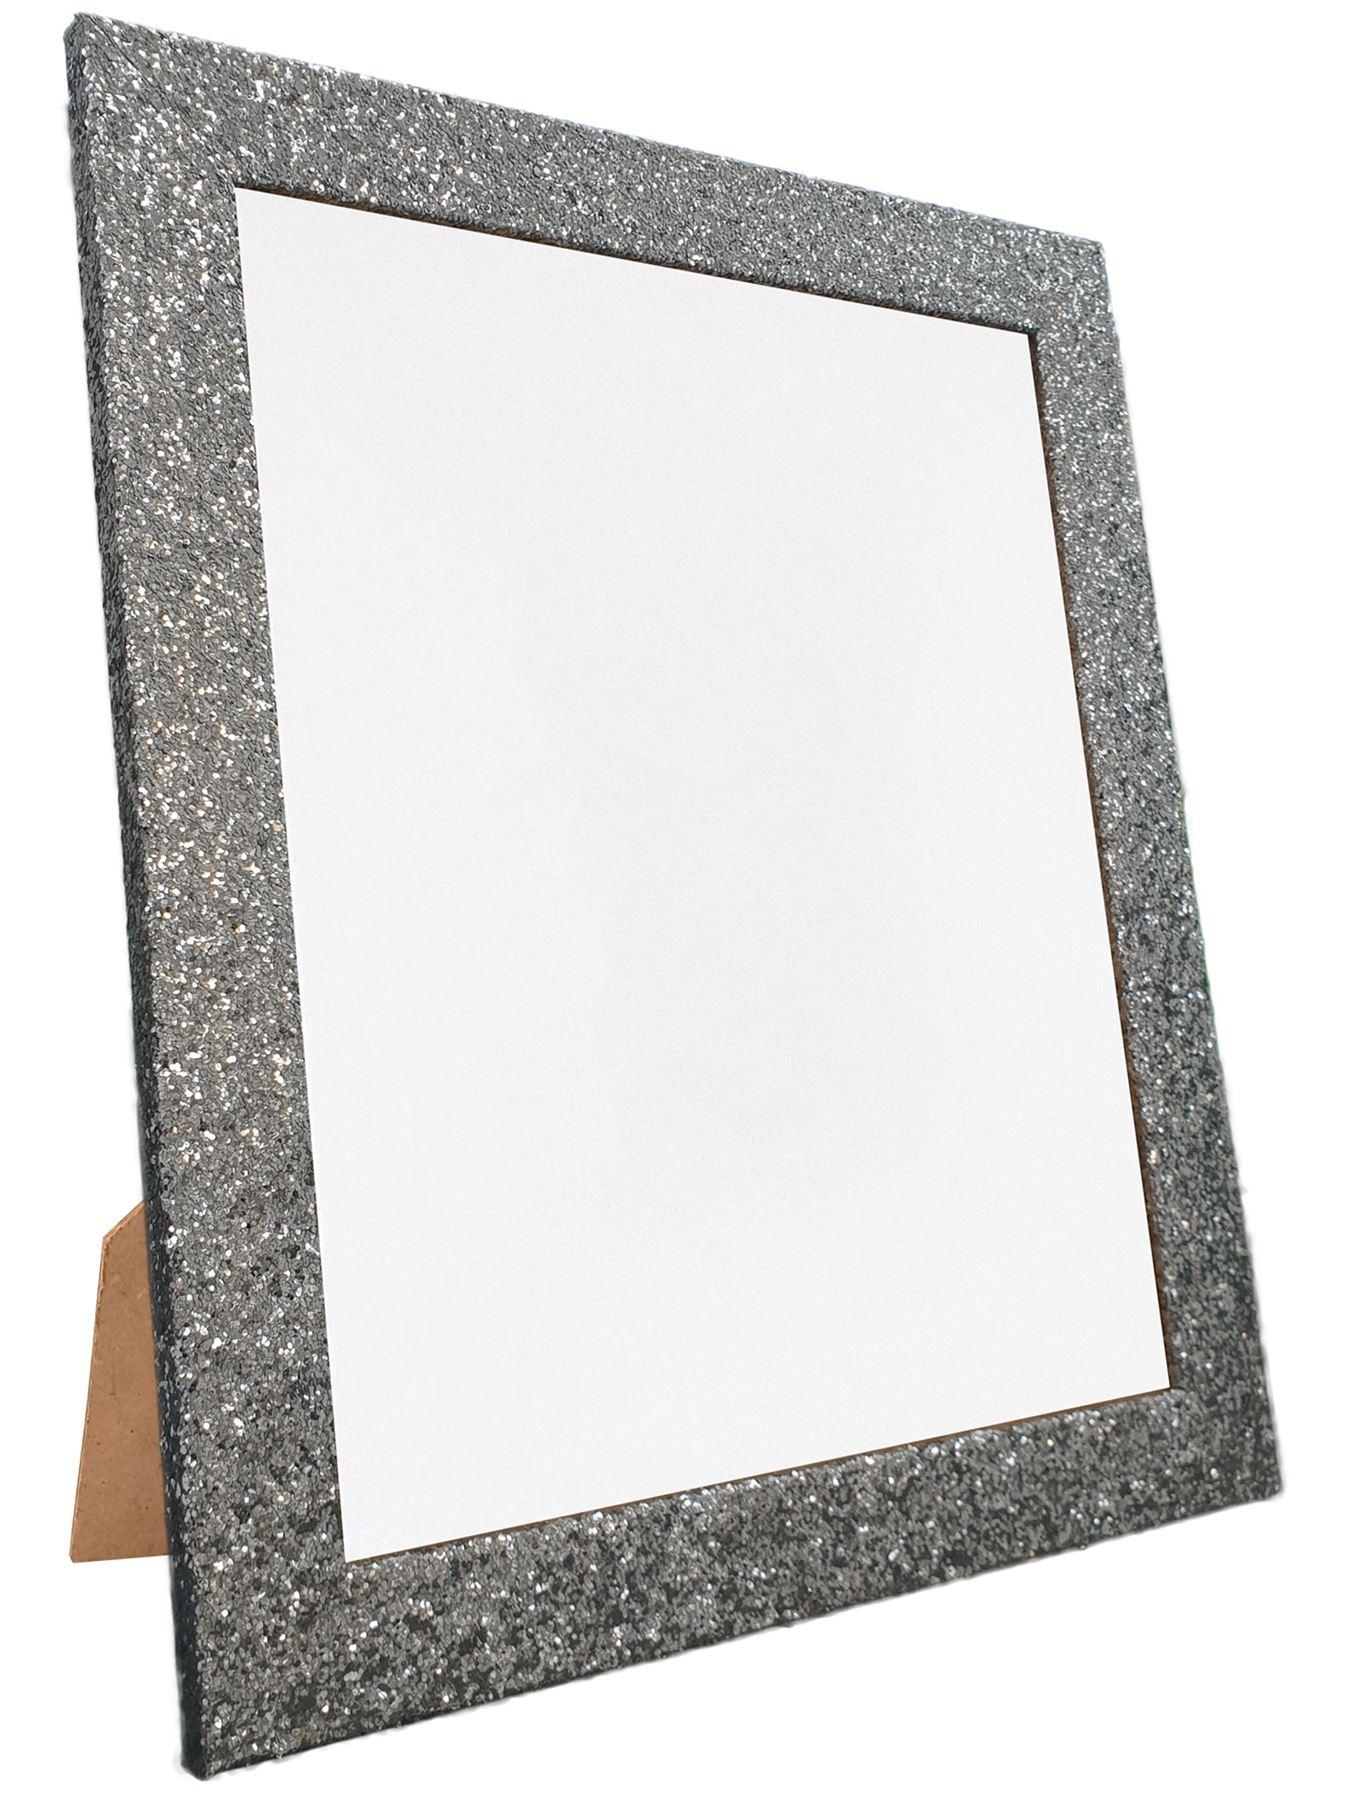 Groß Gold And Silver Picture Frames Bilder - Bilderrahmen Ideen ...